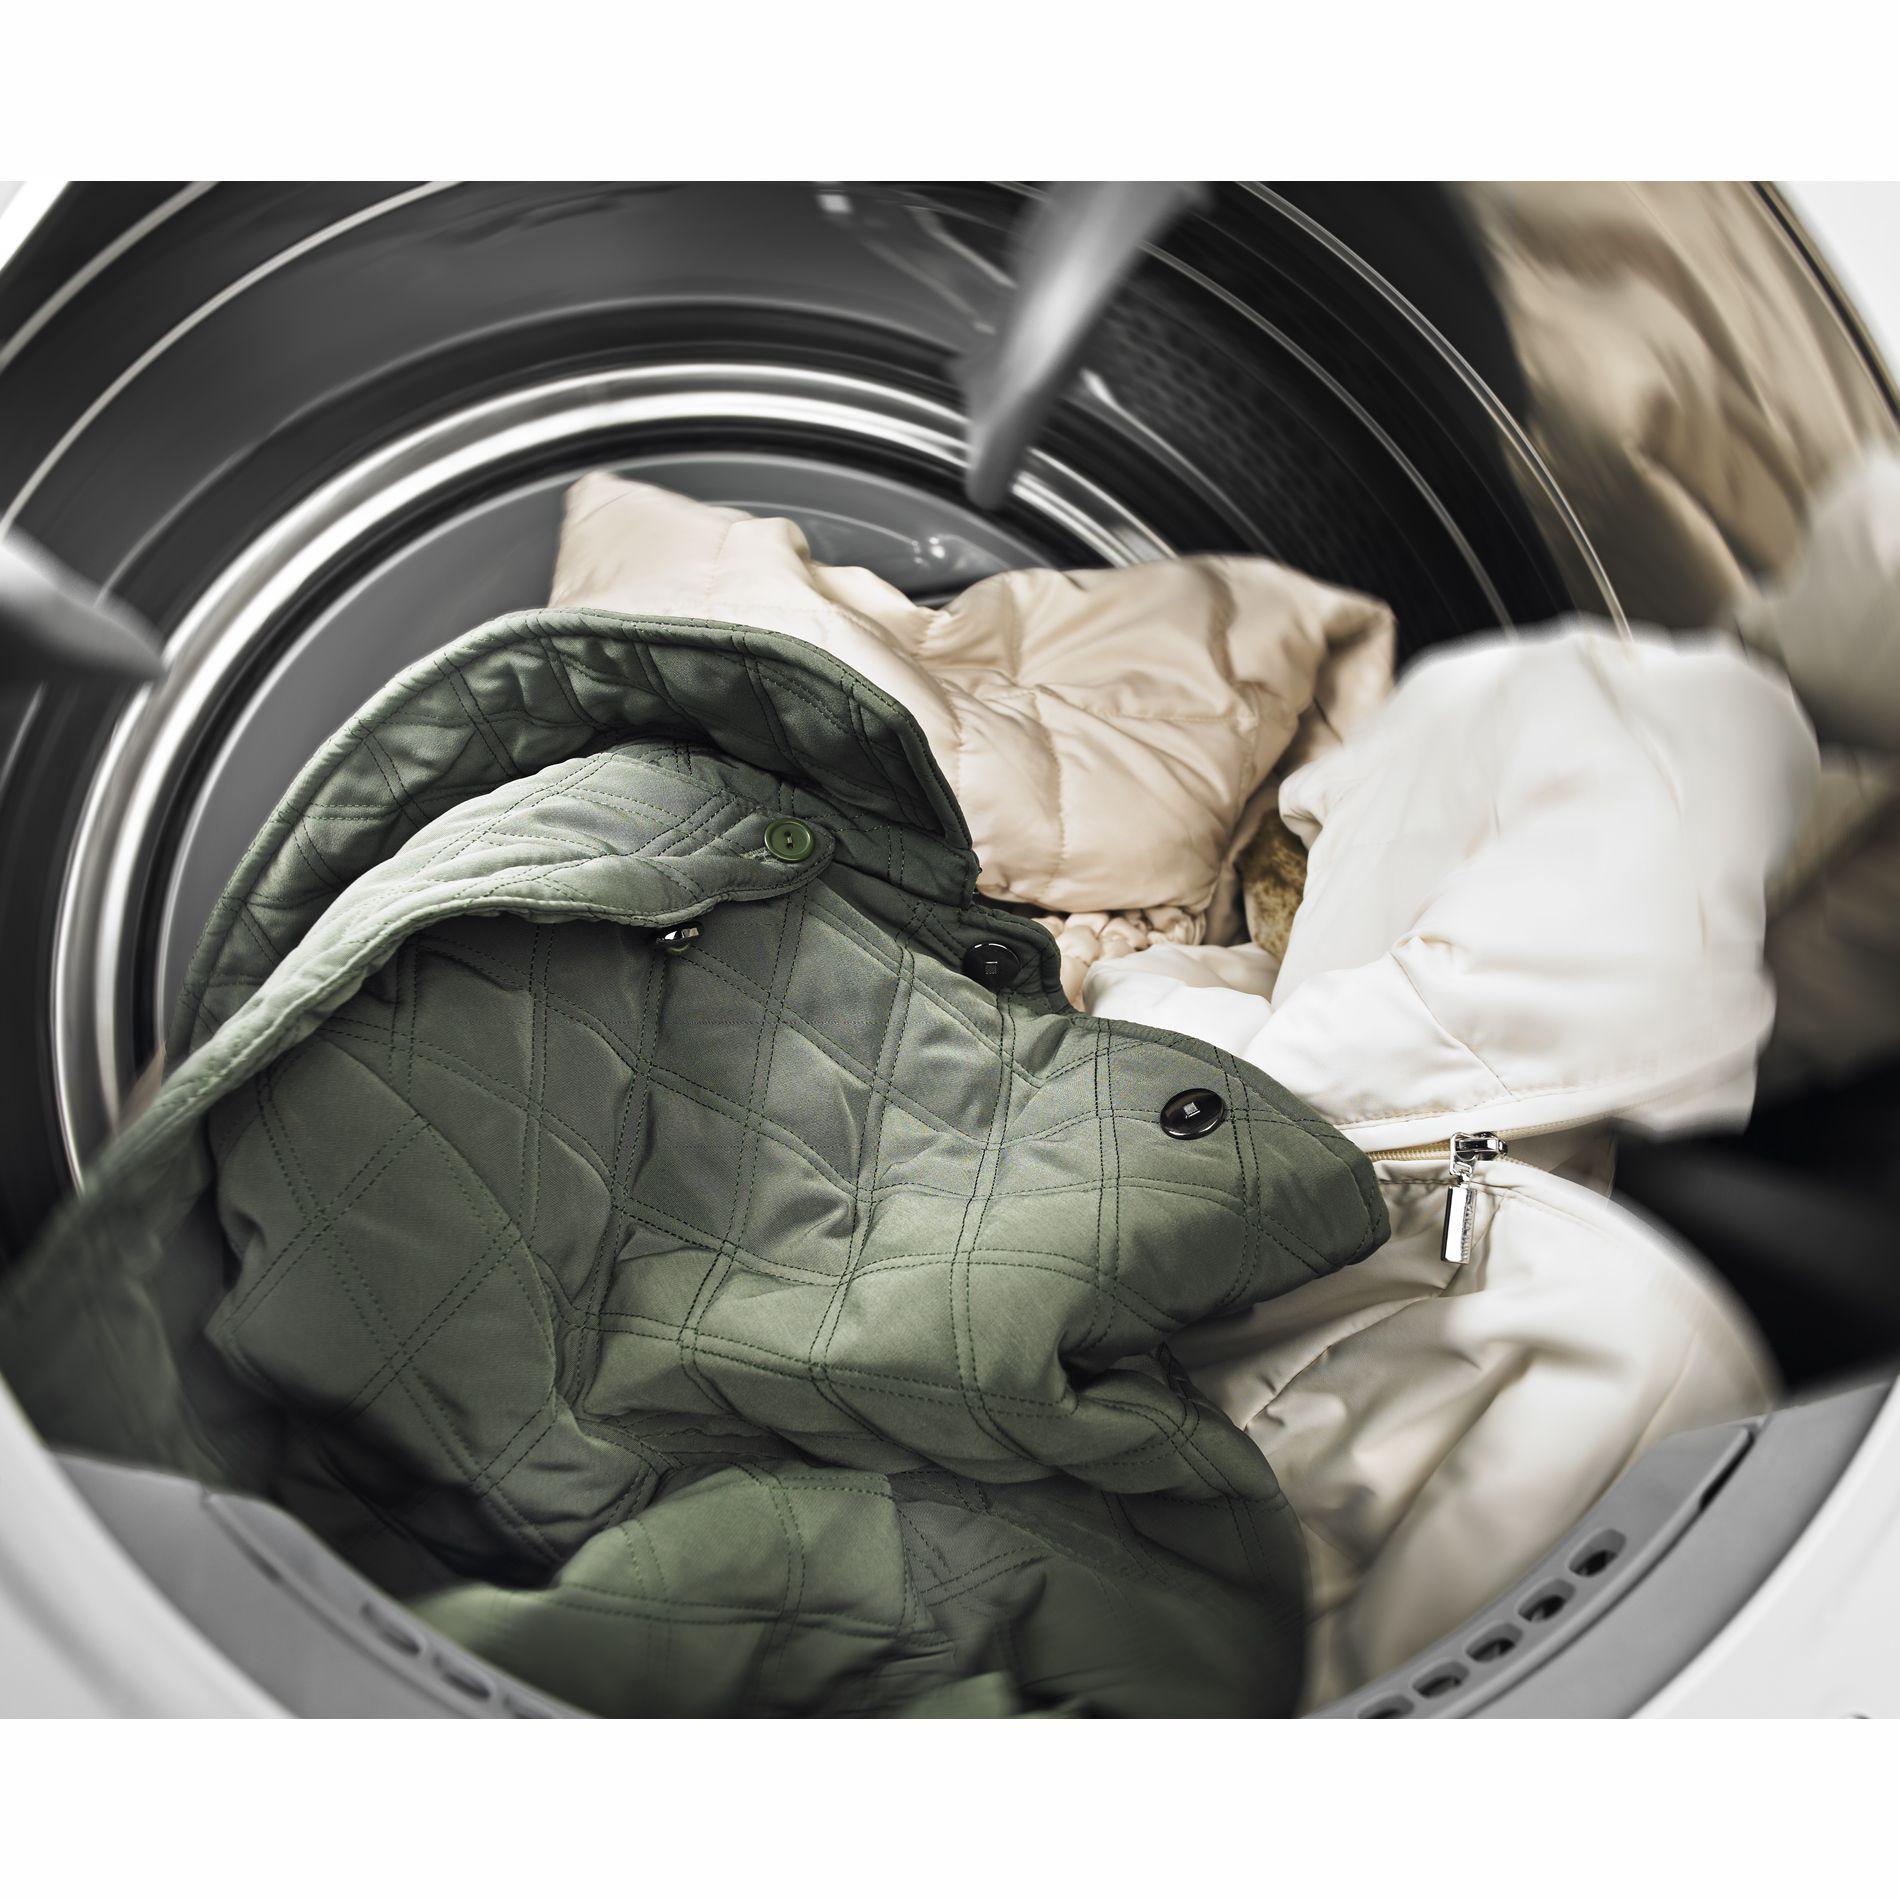 Whirlpool 7.4 cu. ft. Steam Electric Dryer